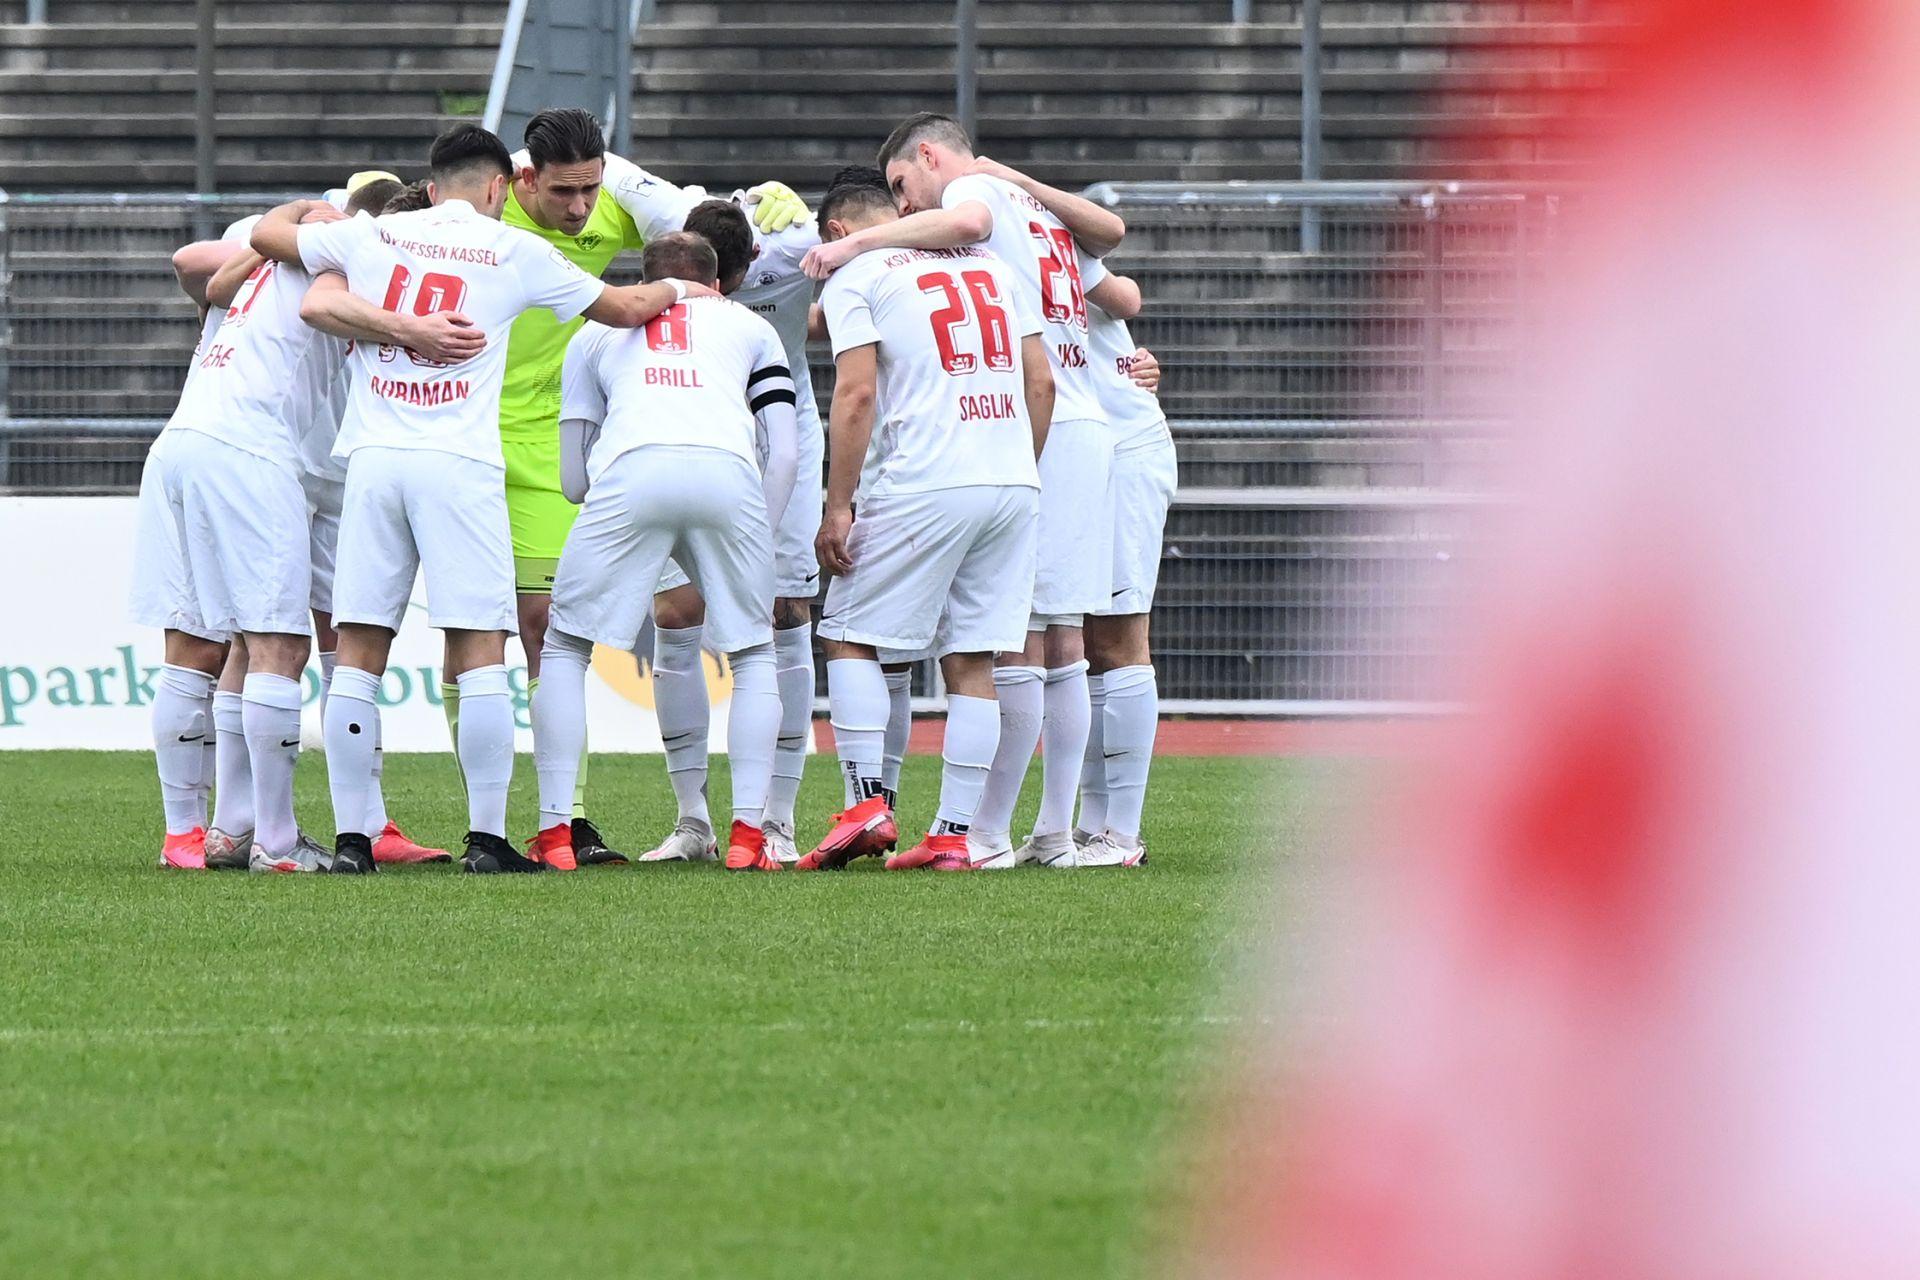 Regionalliga Südwest 2020/21, KSV Hessen Kassel, Kickers Offenbach, Endstand 0:4, Mannschaftskreis